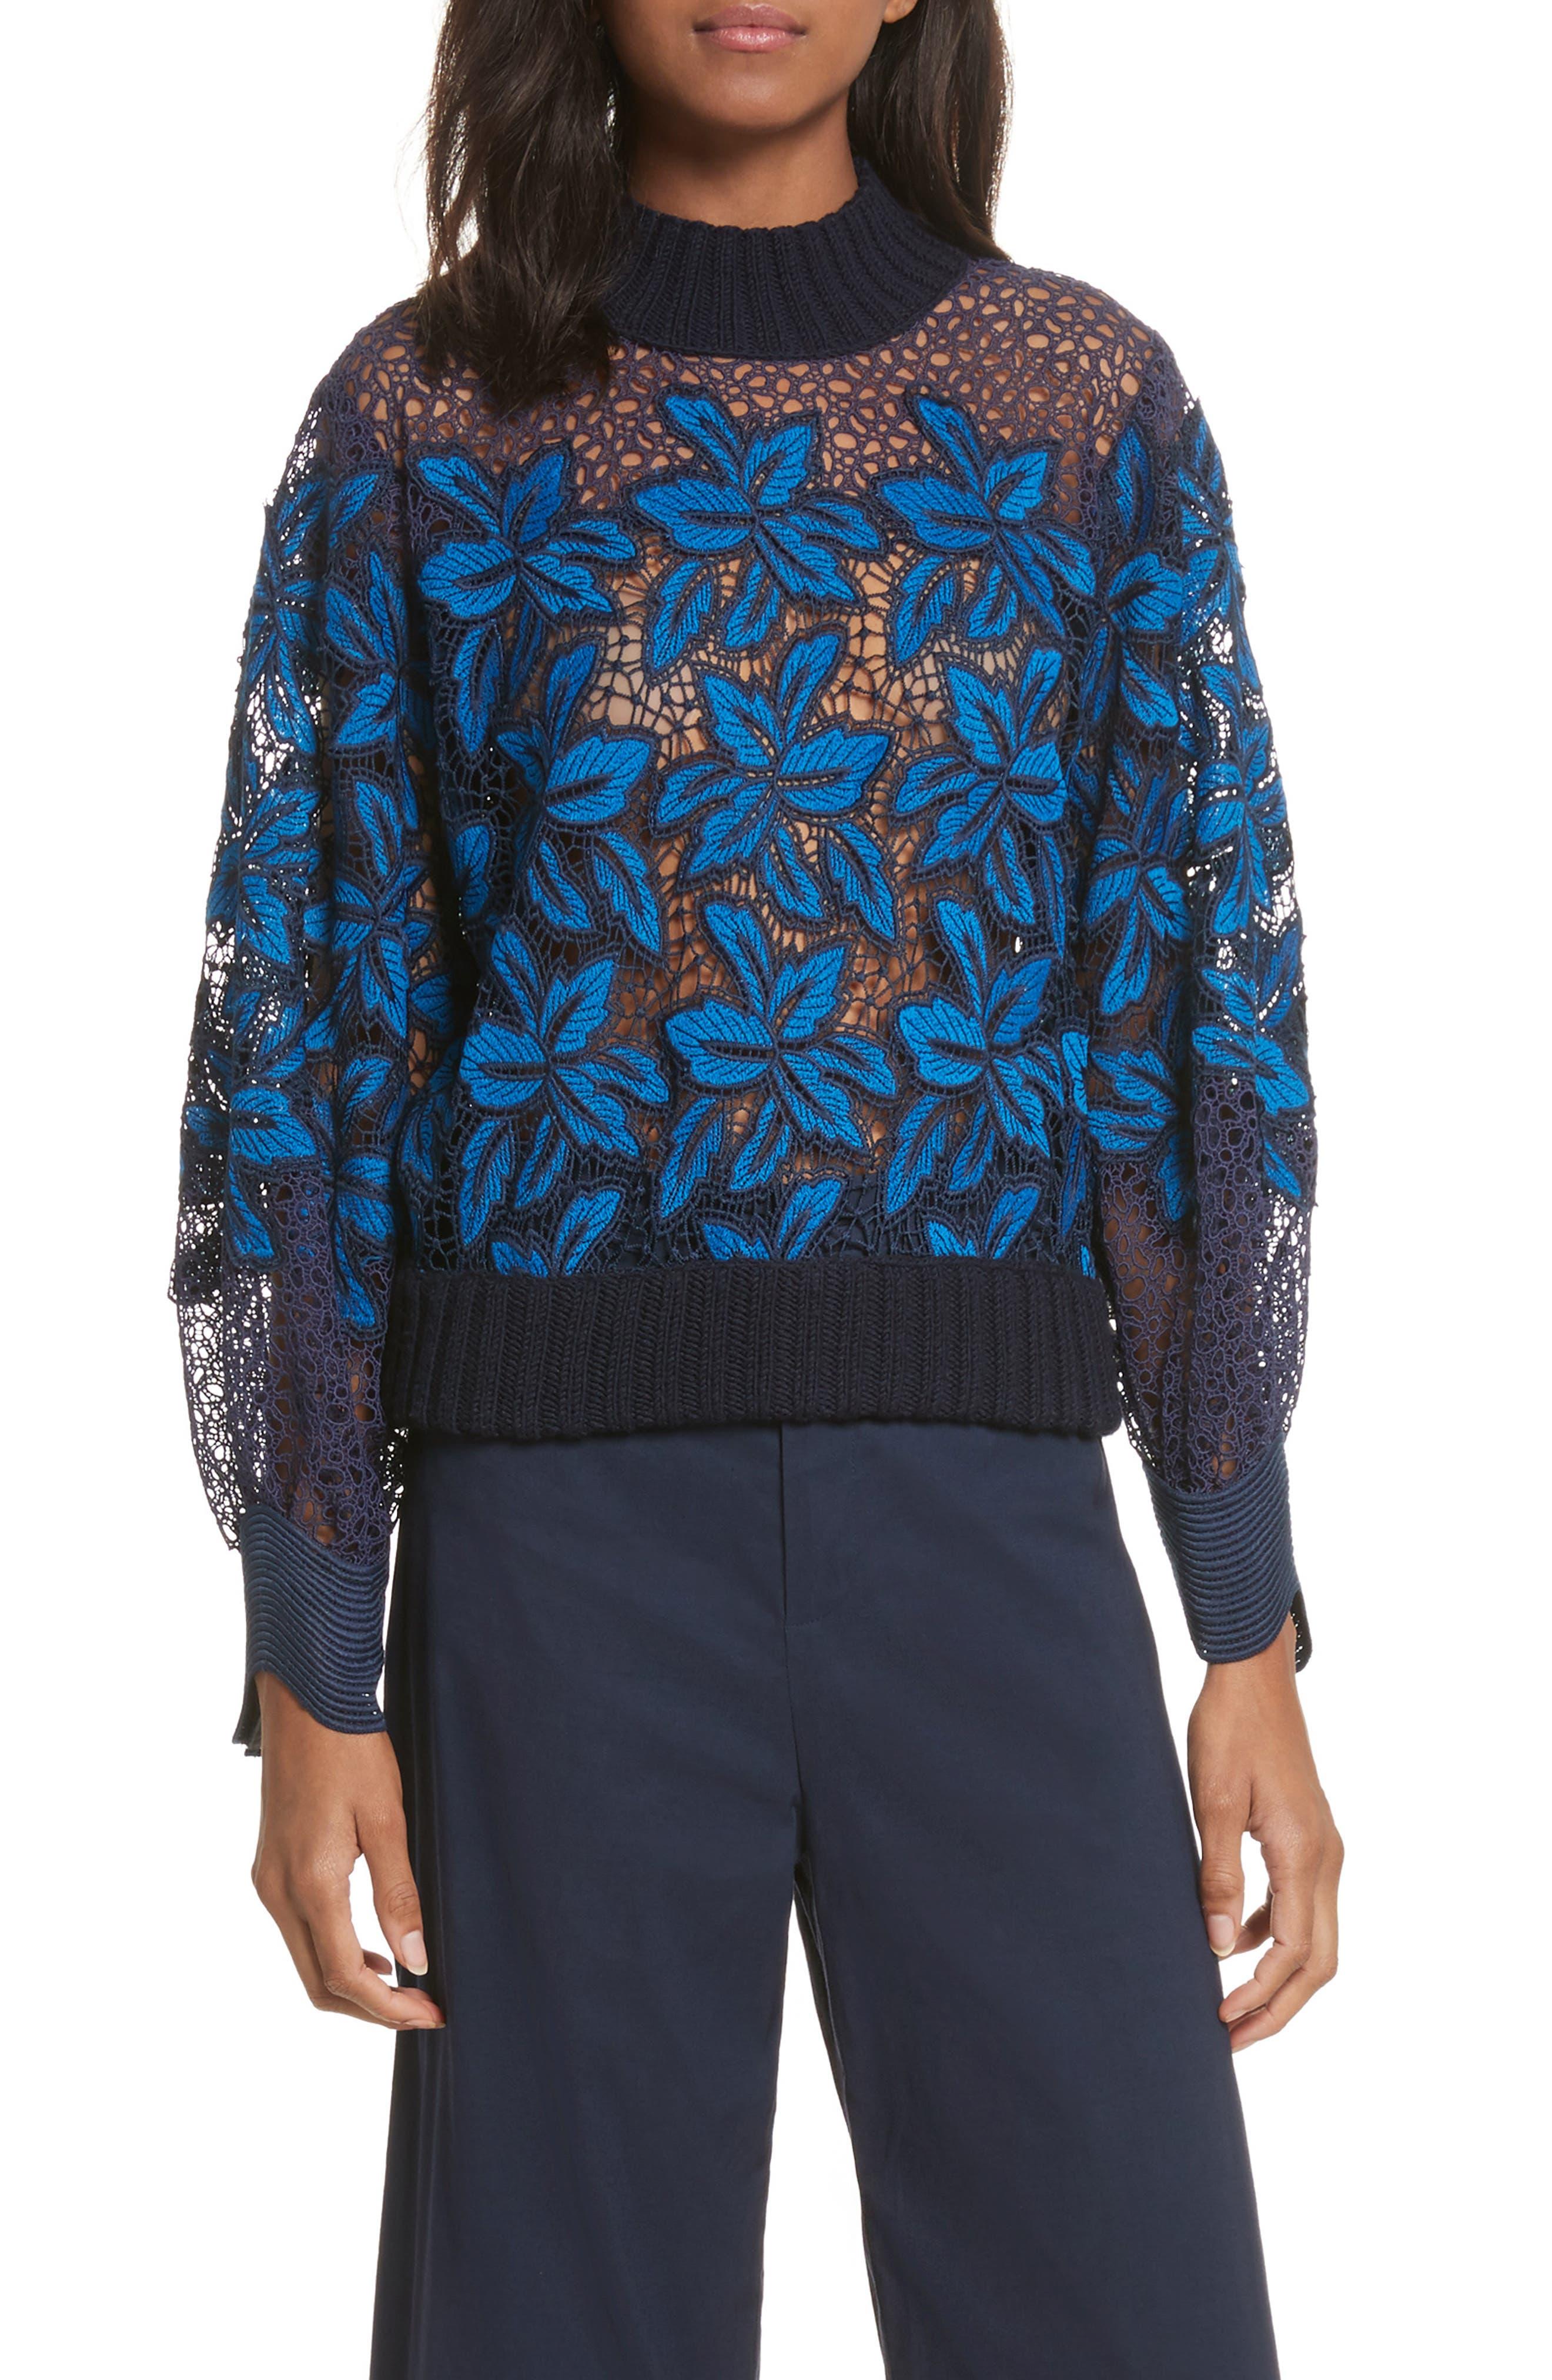 Main Image - Sea Mosaic Lace Bell Sleeve Sweatshirt